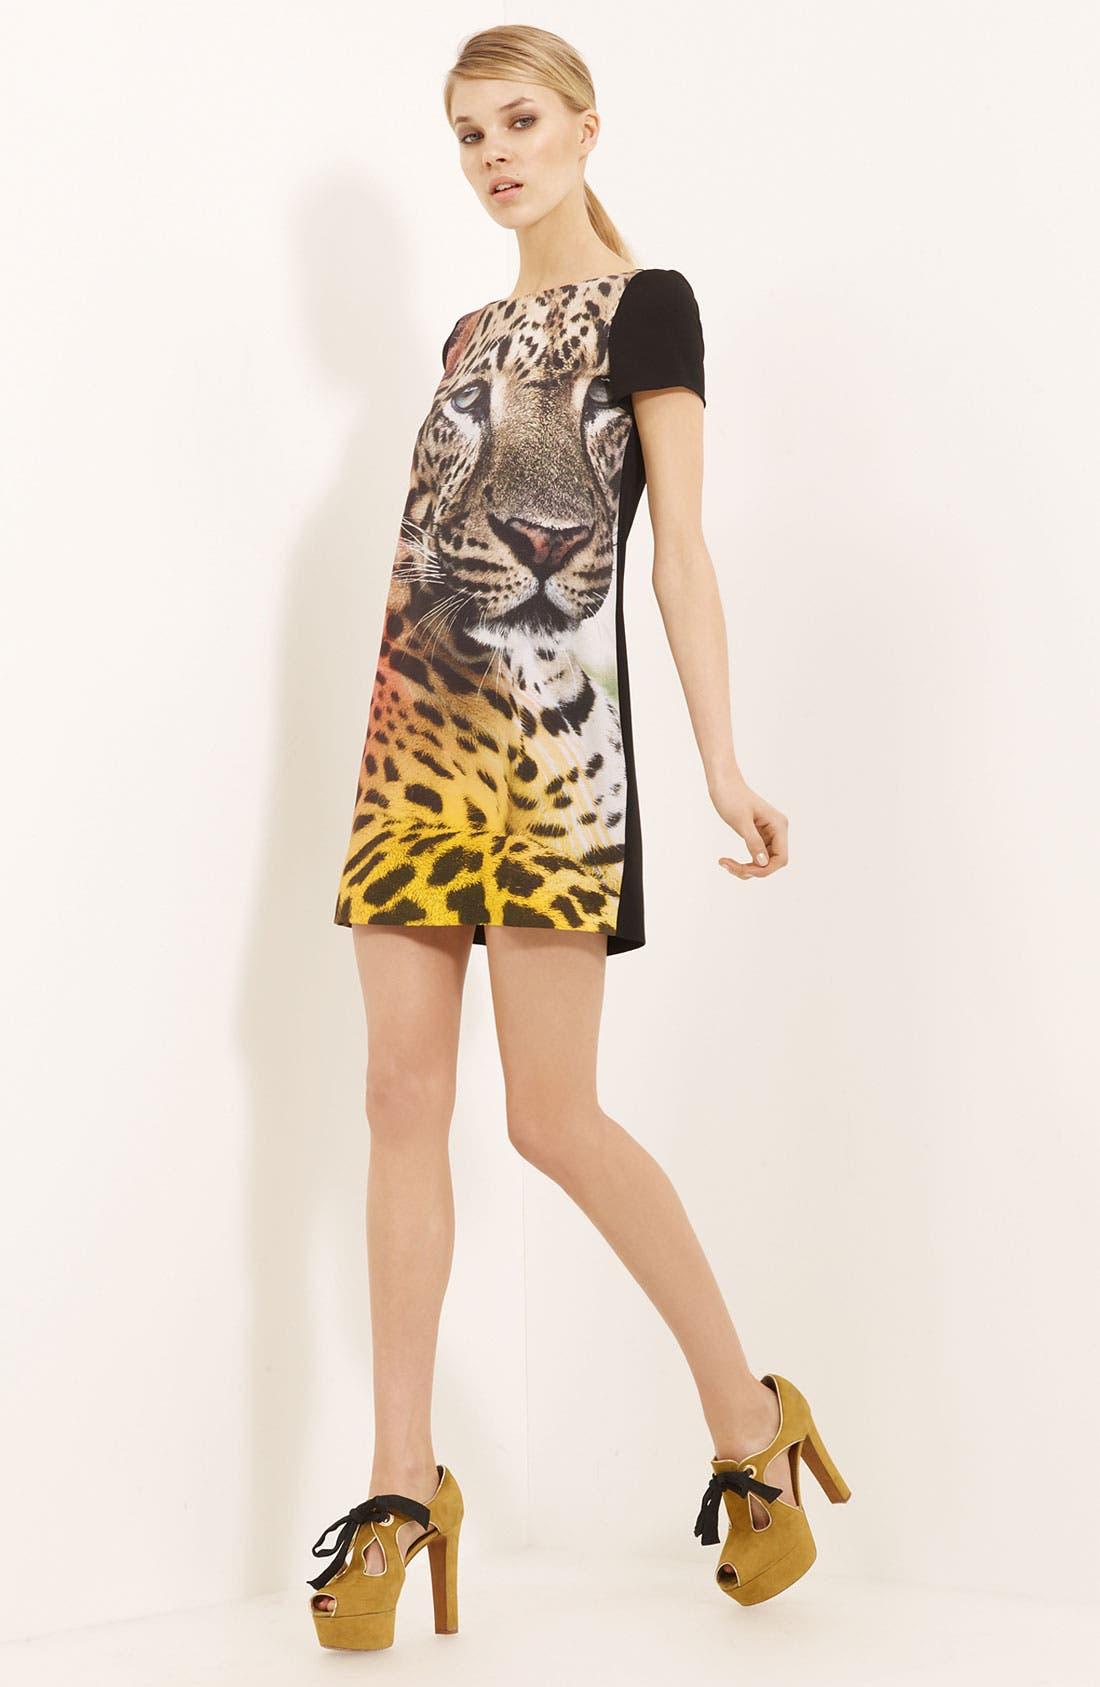 Alternate Image 1 Selected - Moschino Cheap & Chic Cheetah Print Crepe Dress